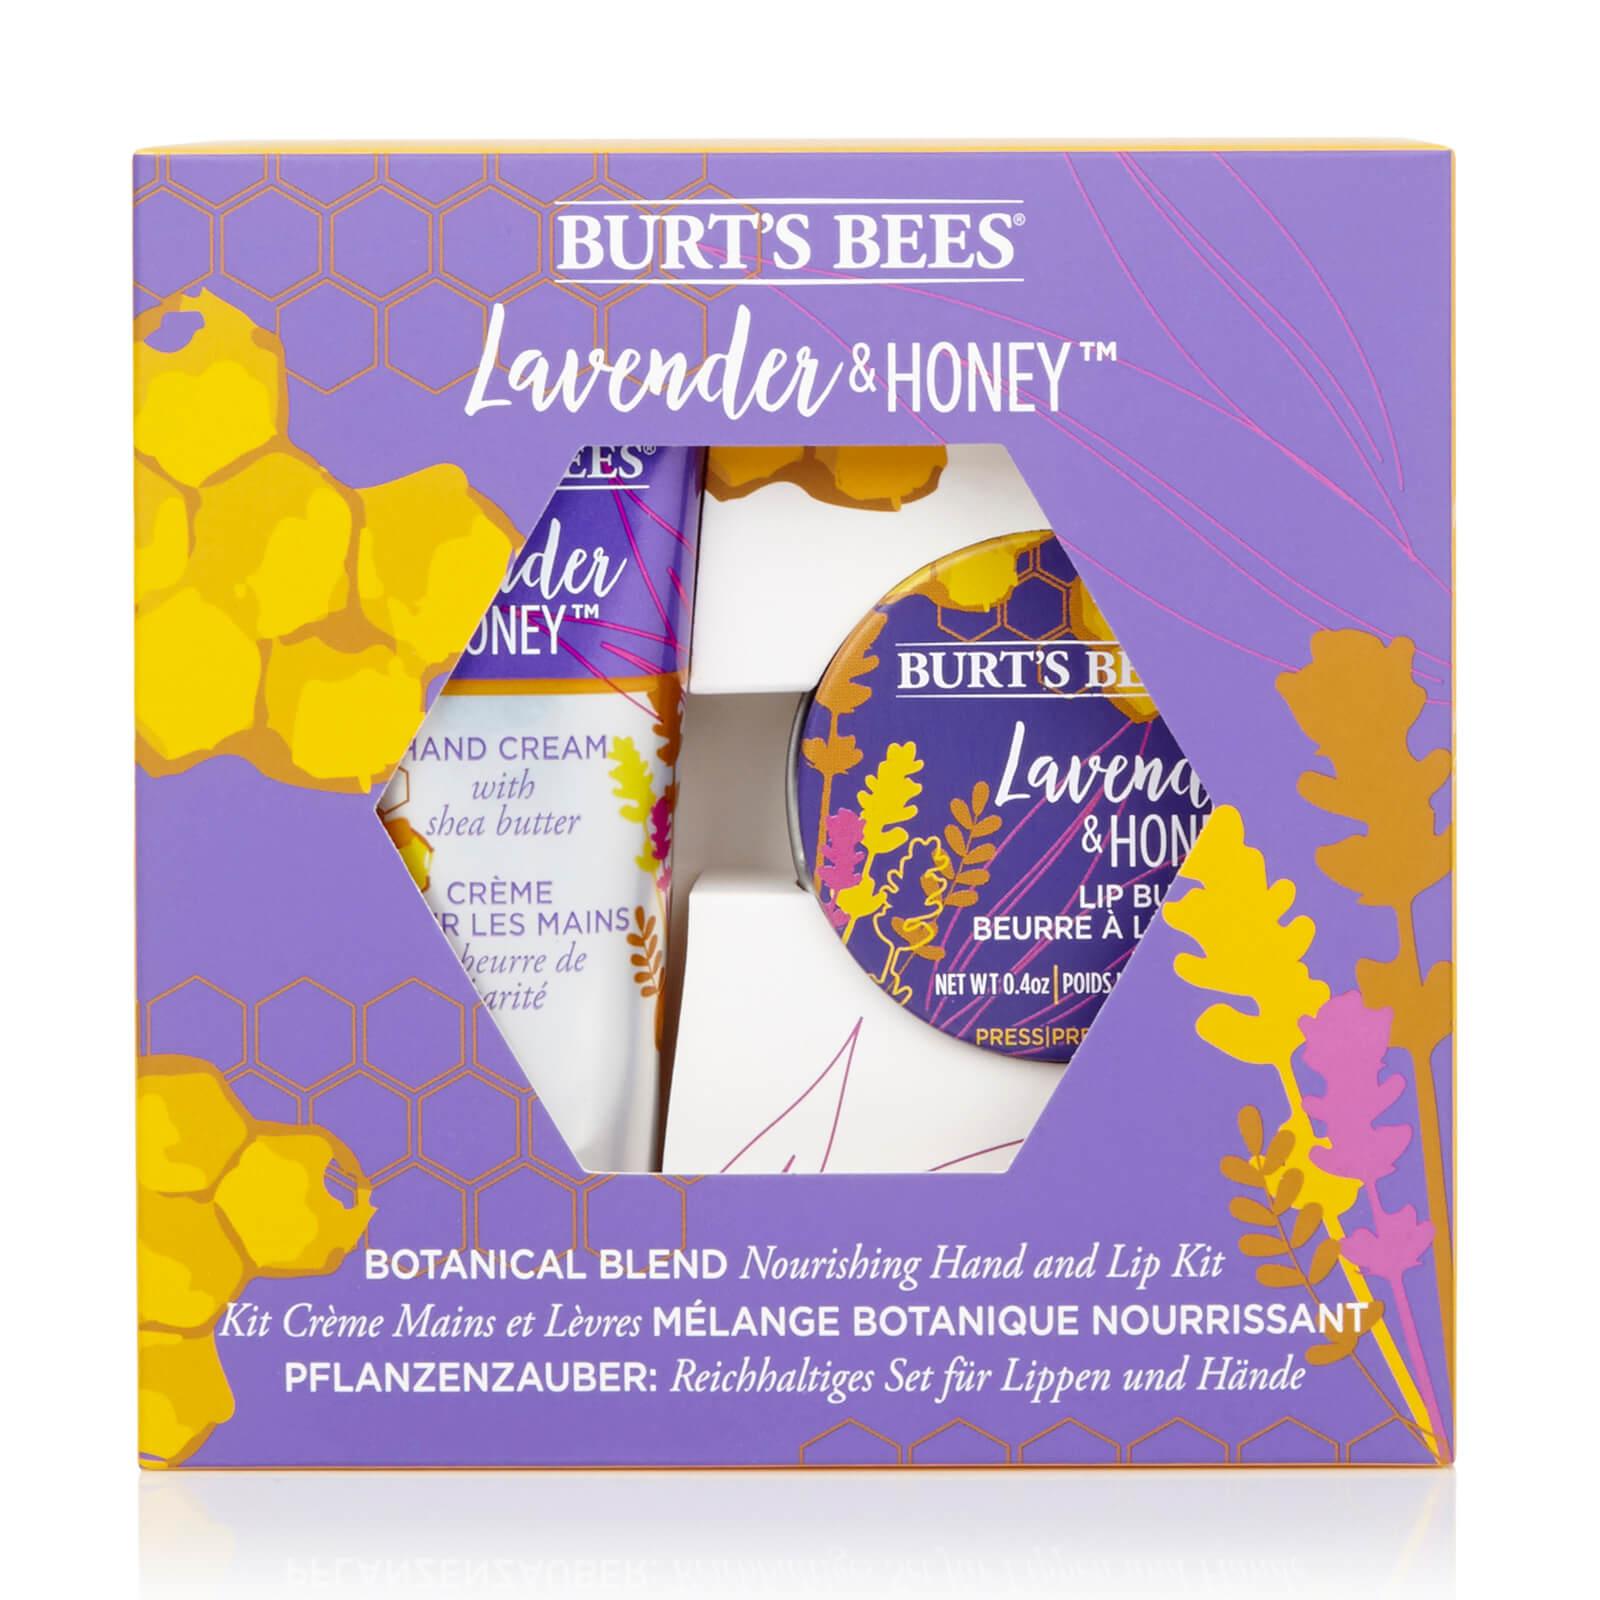 Burts Bees Burt's Bees Botanical Blend Nourishing Hand and Lip Kit - Lavender & Honey